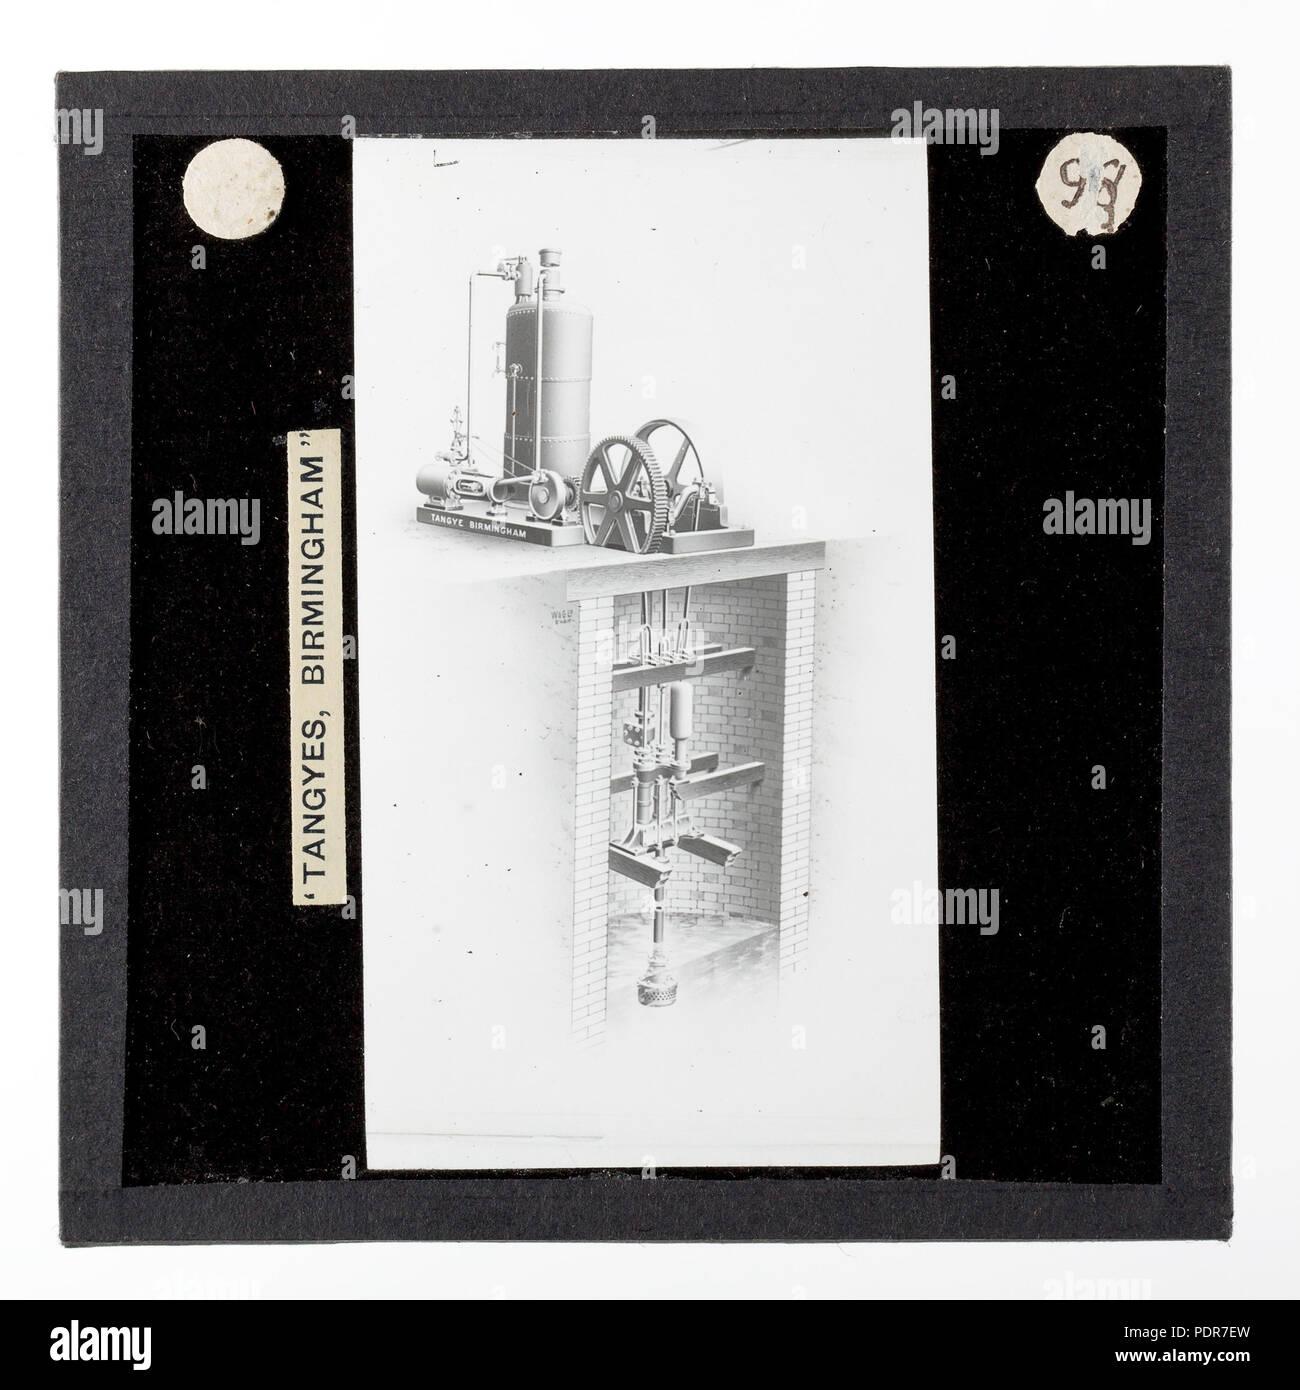 77 Lantern Slide - Tangyes Ltd, Horizontal Steam Engine, Vertical Steam  Boiler & Water Pump, circa 1910